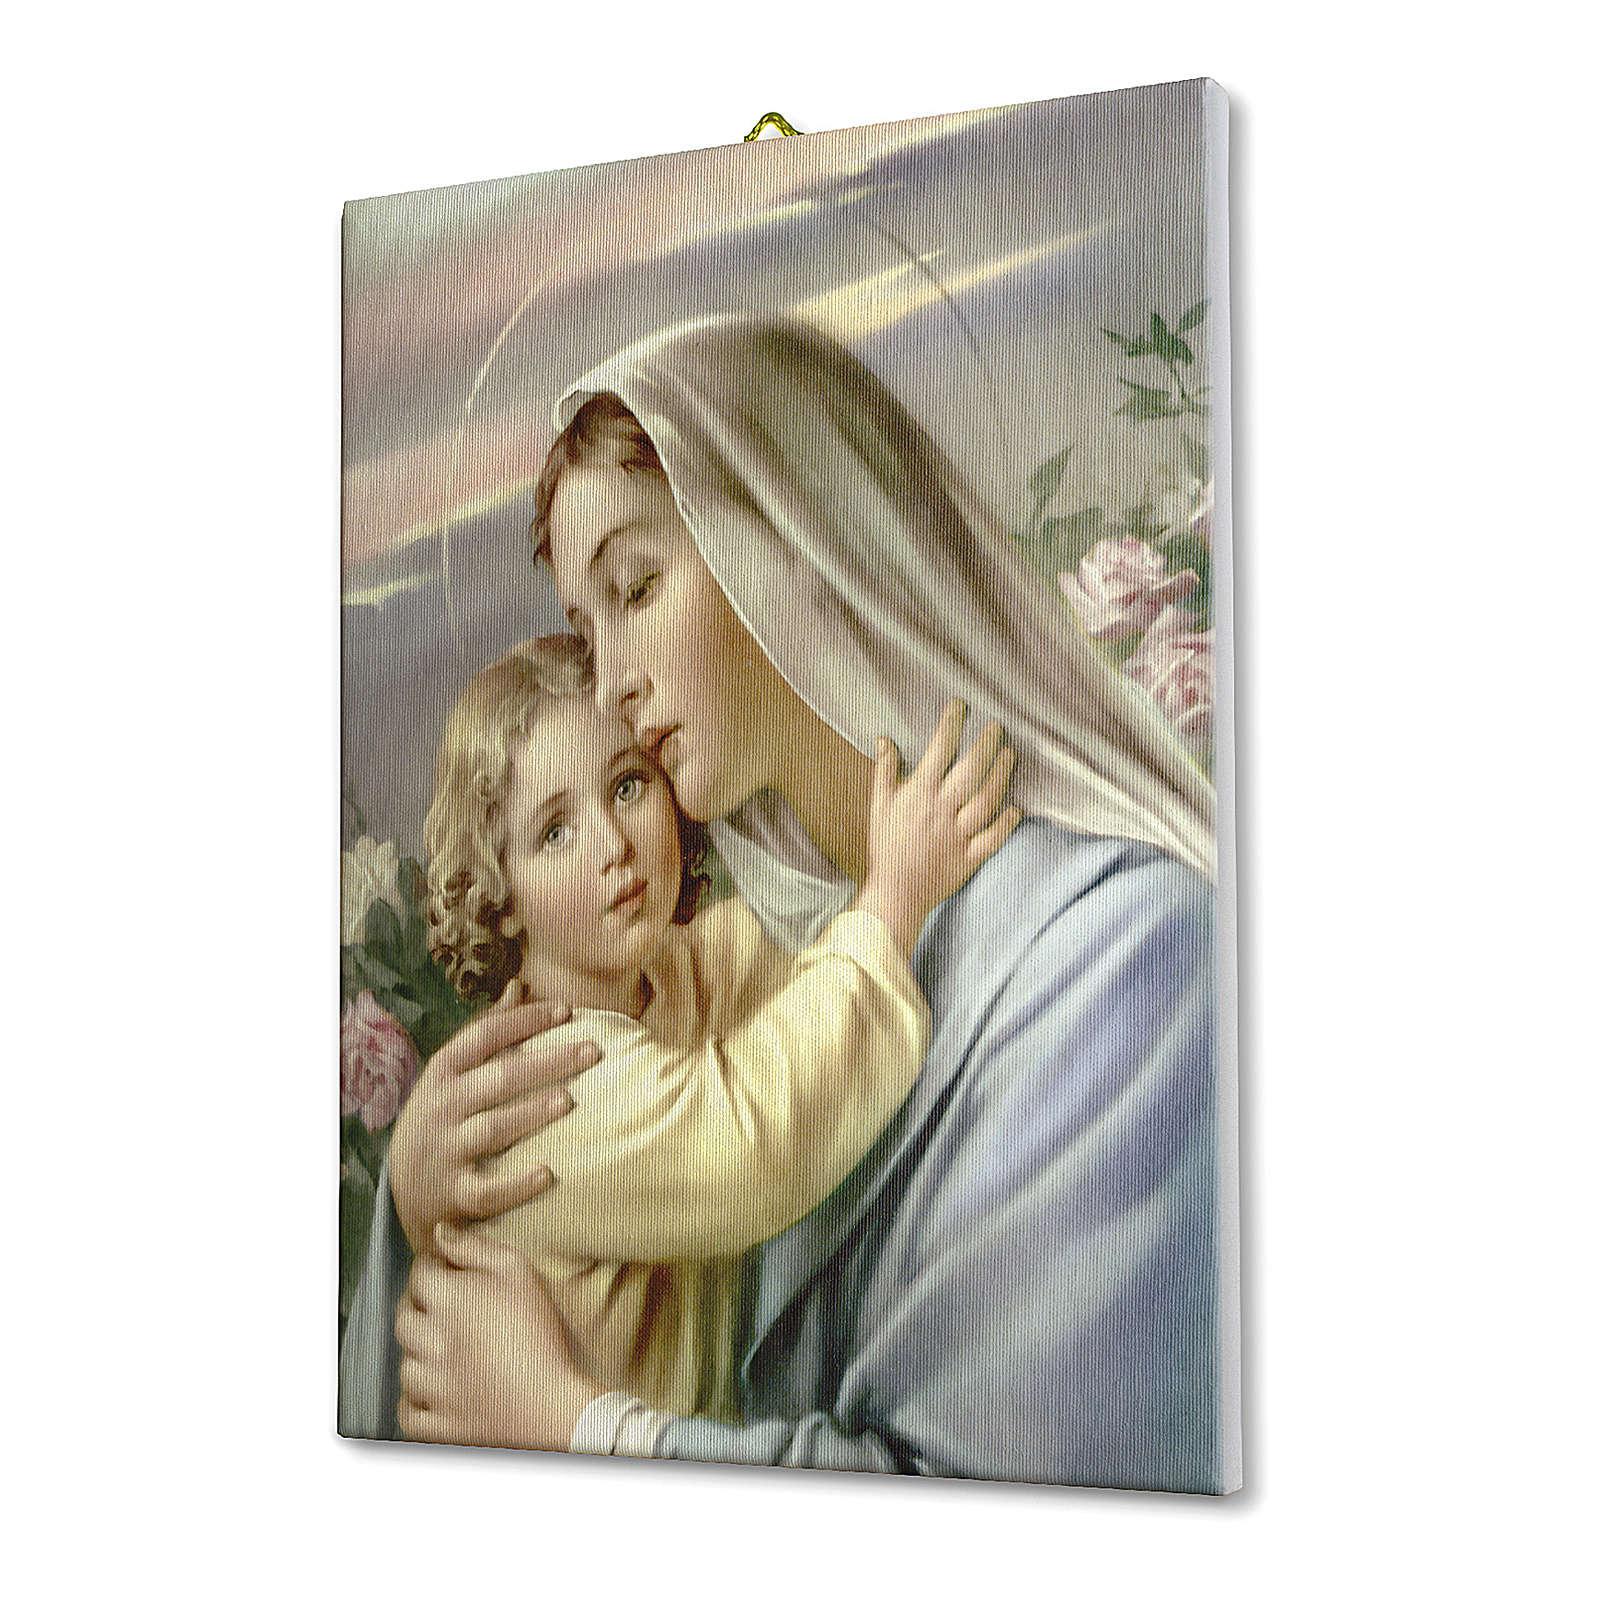 Cuadro sobre tela pictórica Virgen con Niño 40x30 cm 3